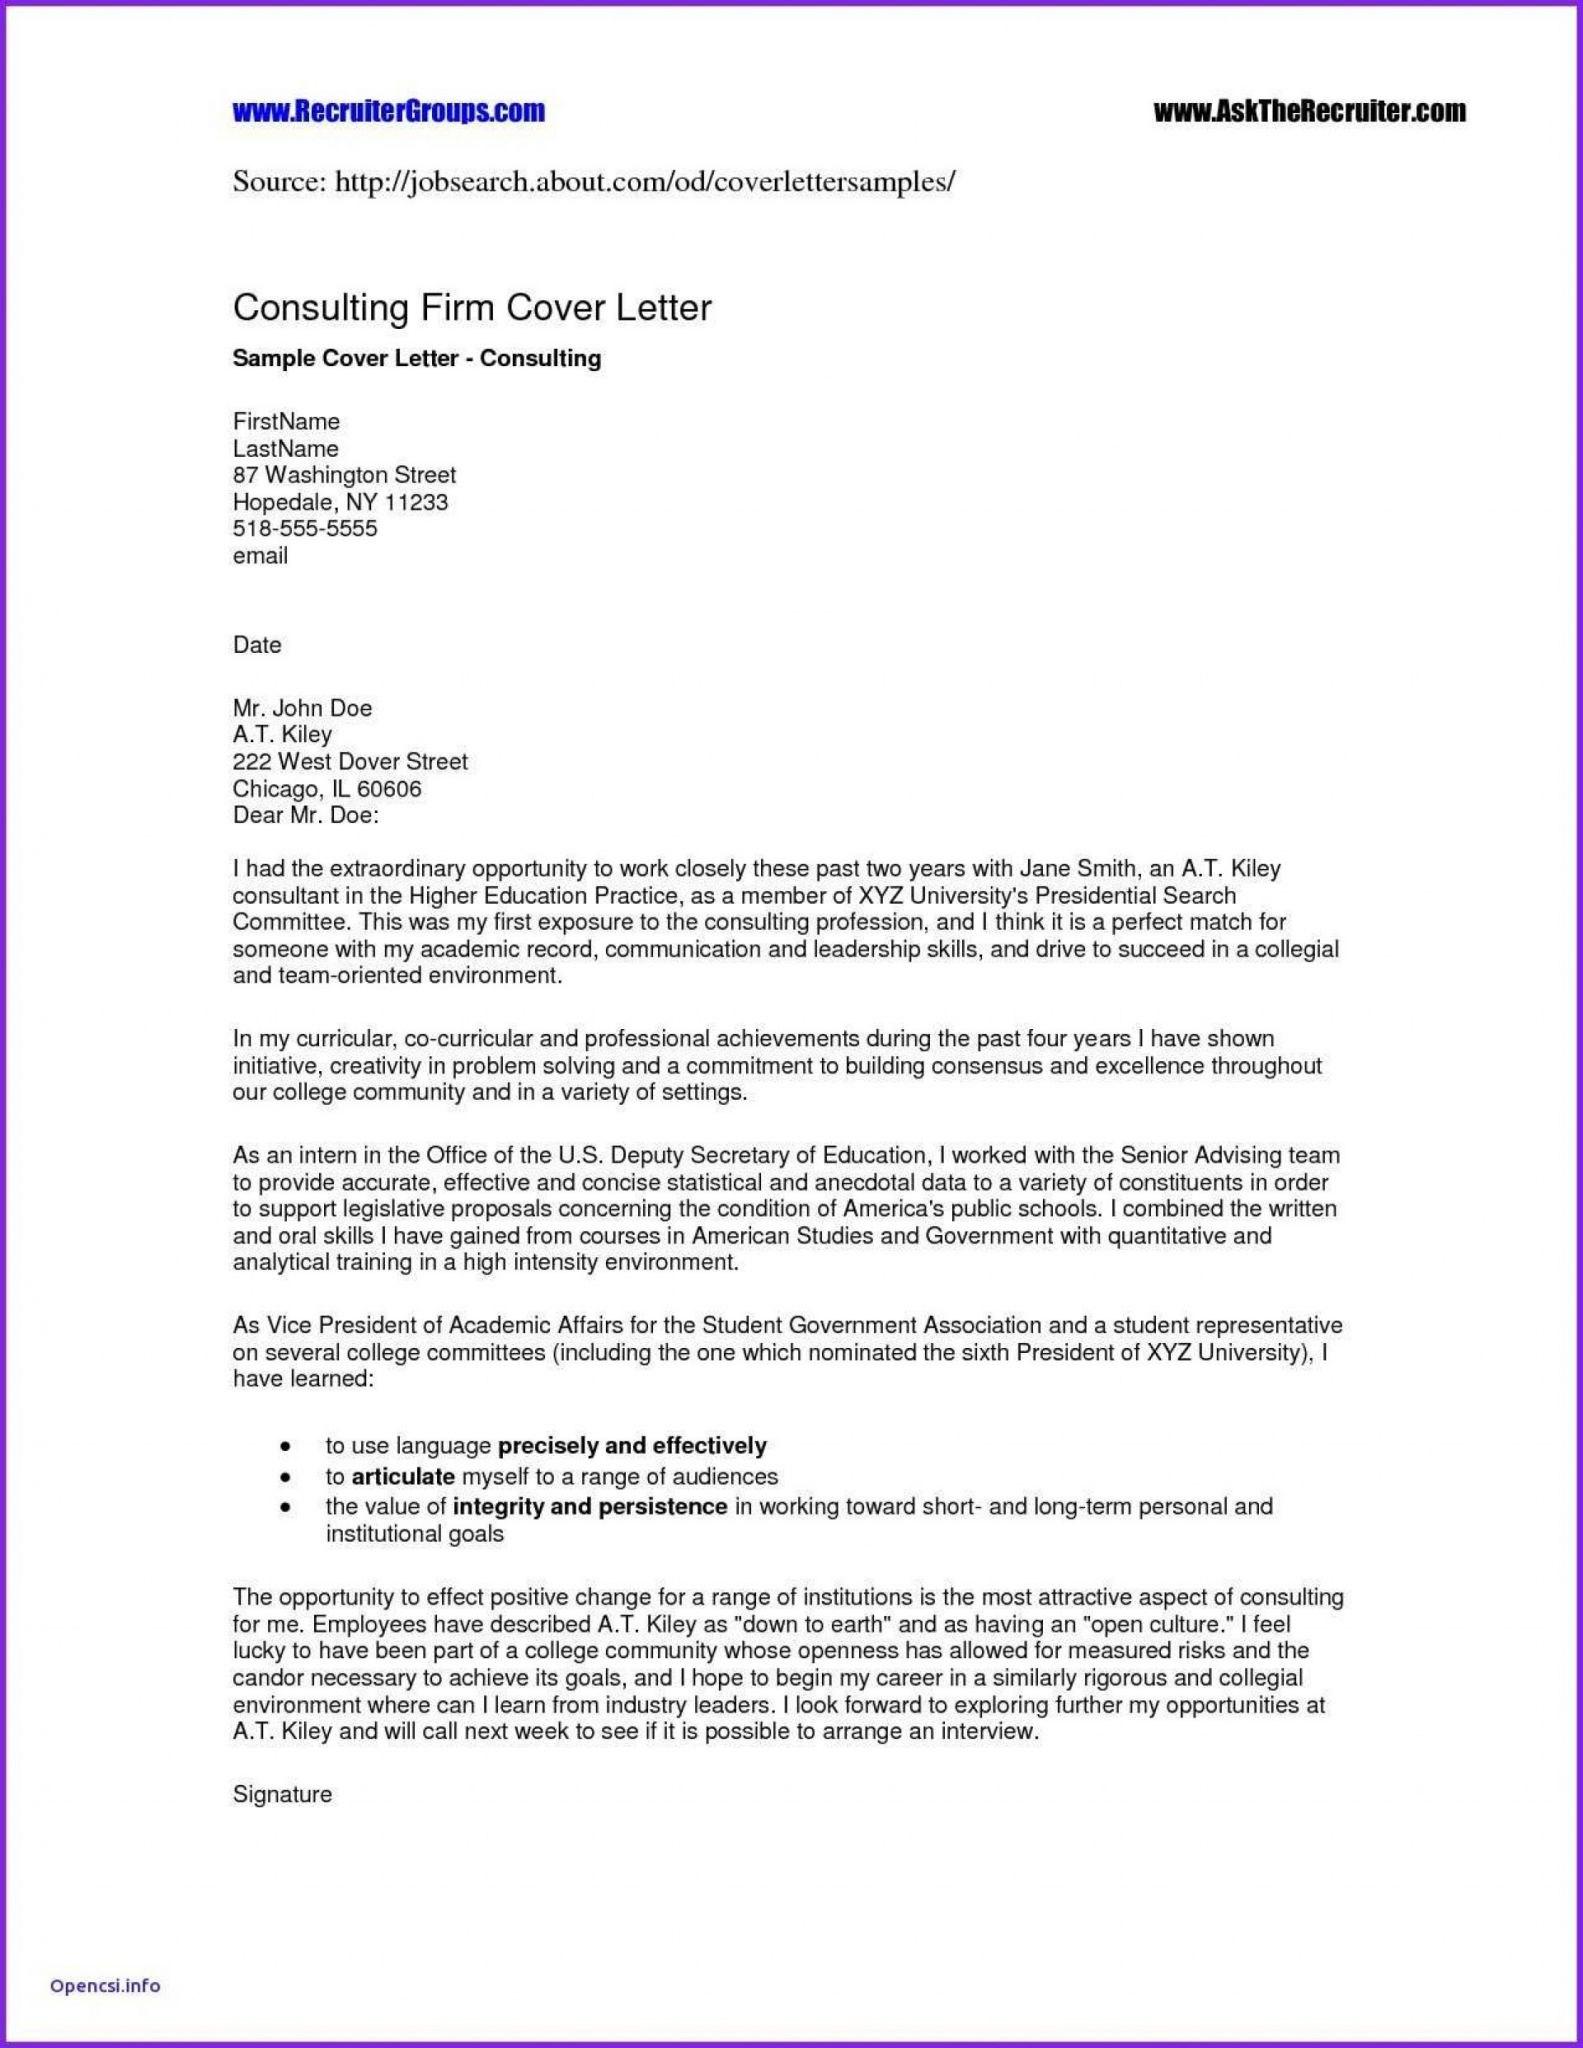 Sample Photography License Agreement  Lera Mera Throughout Photography License Agreement Template